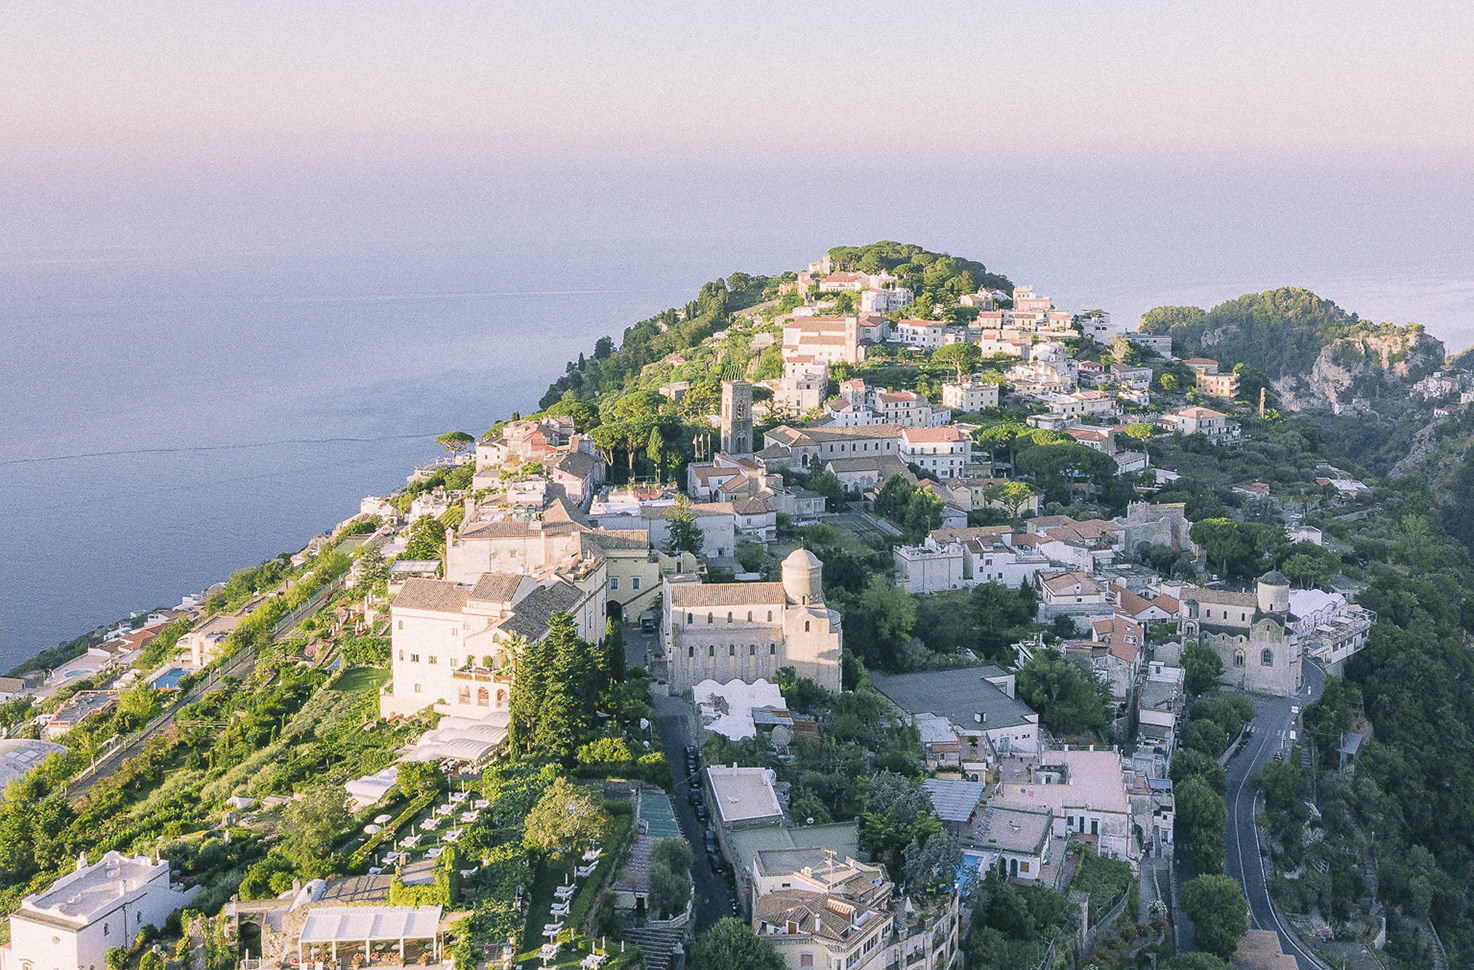 Ravello on the Amalfi Coast of Italy